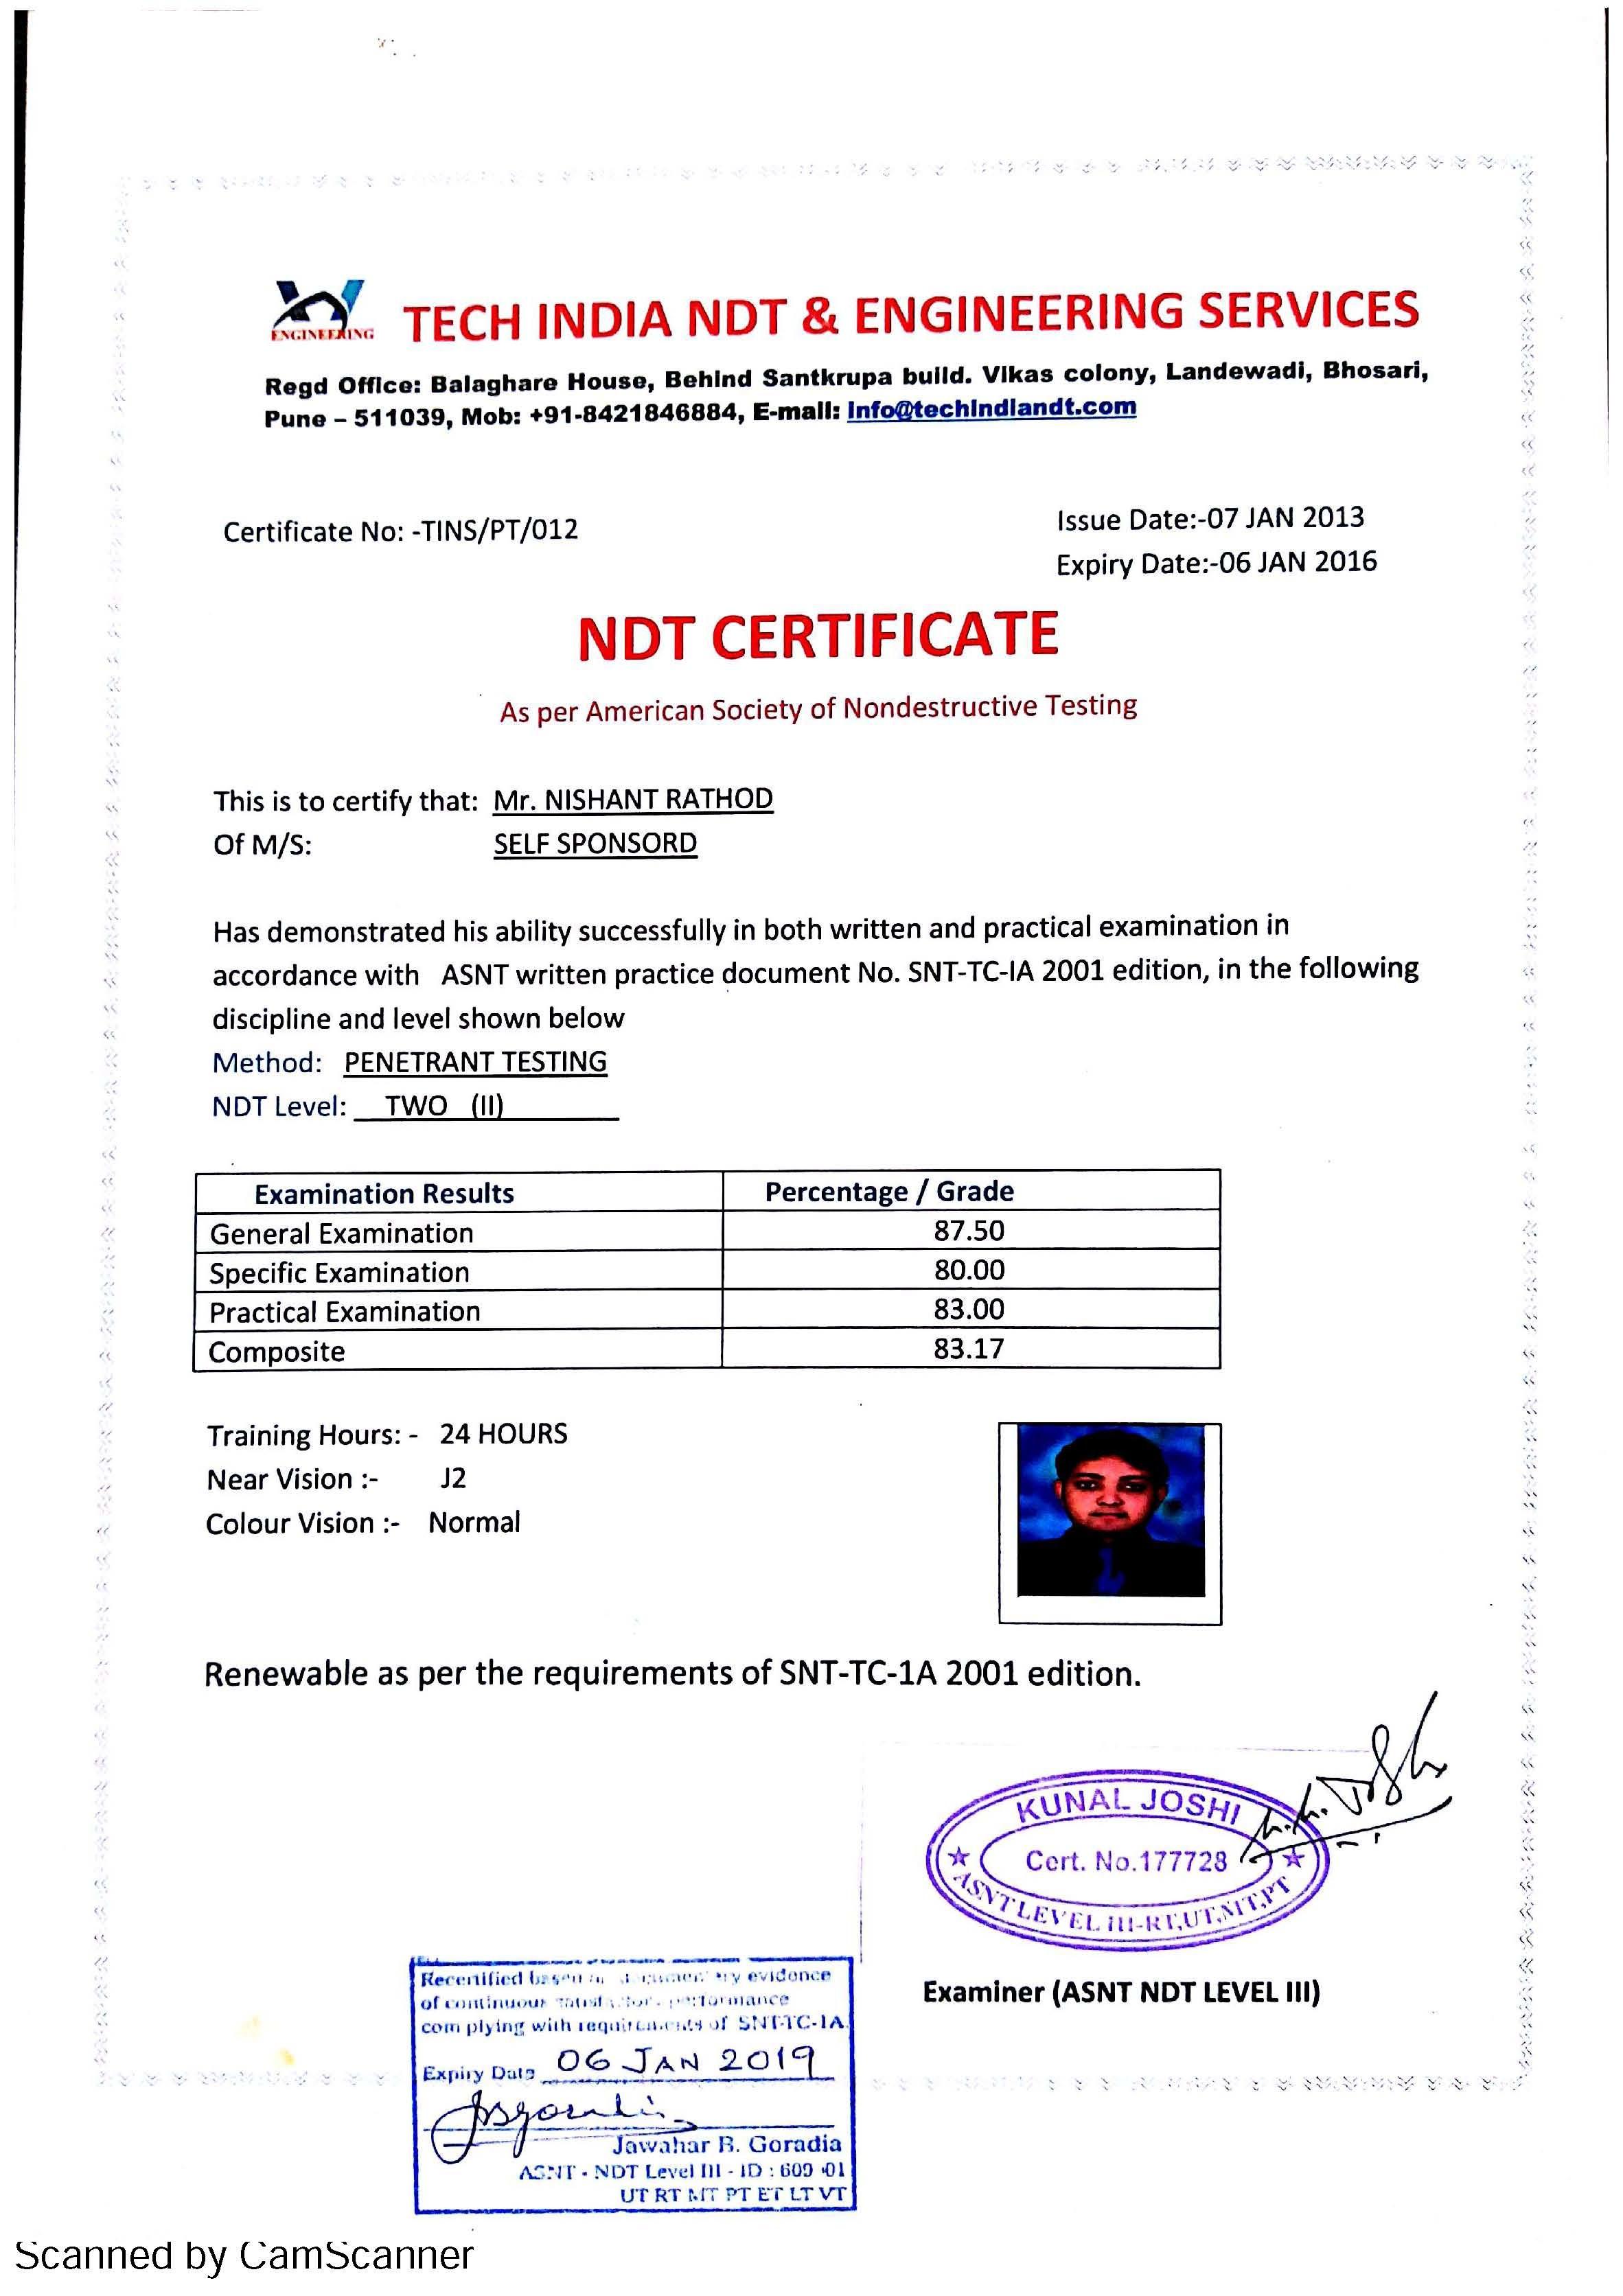 Asnt Ndt Level 2 Certificate Verification Best Design Sertificate 2018